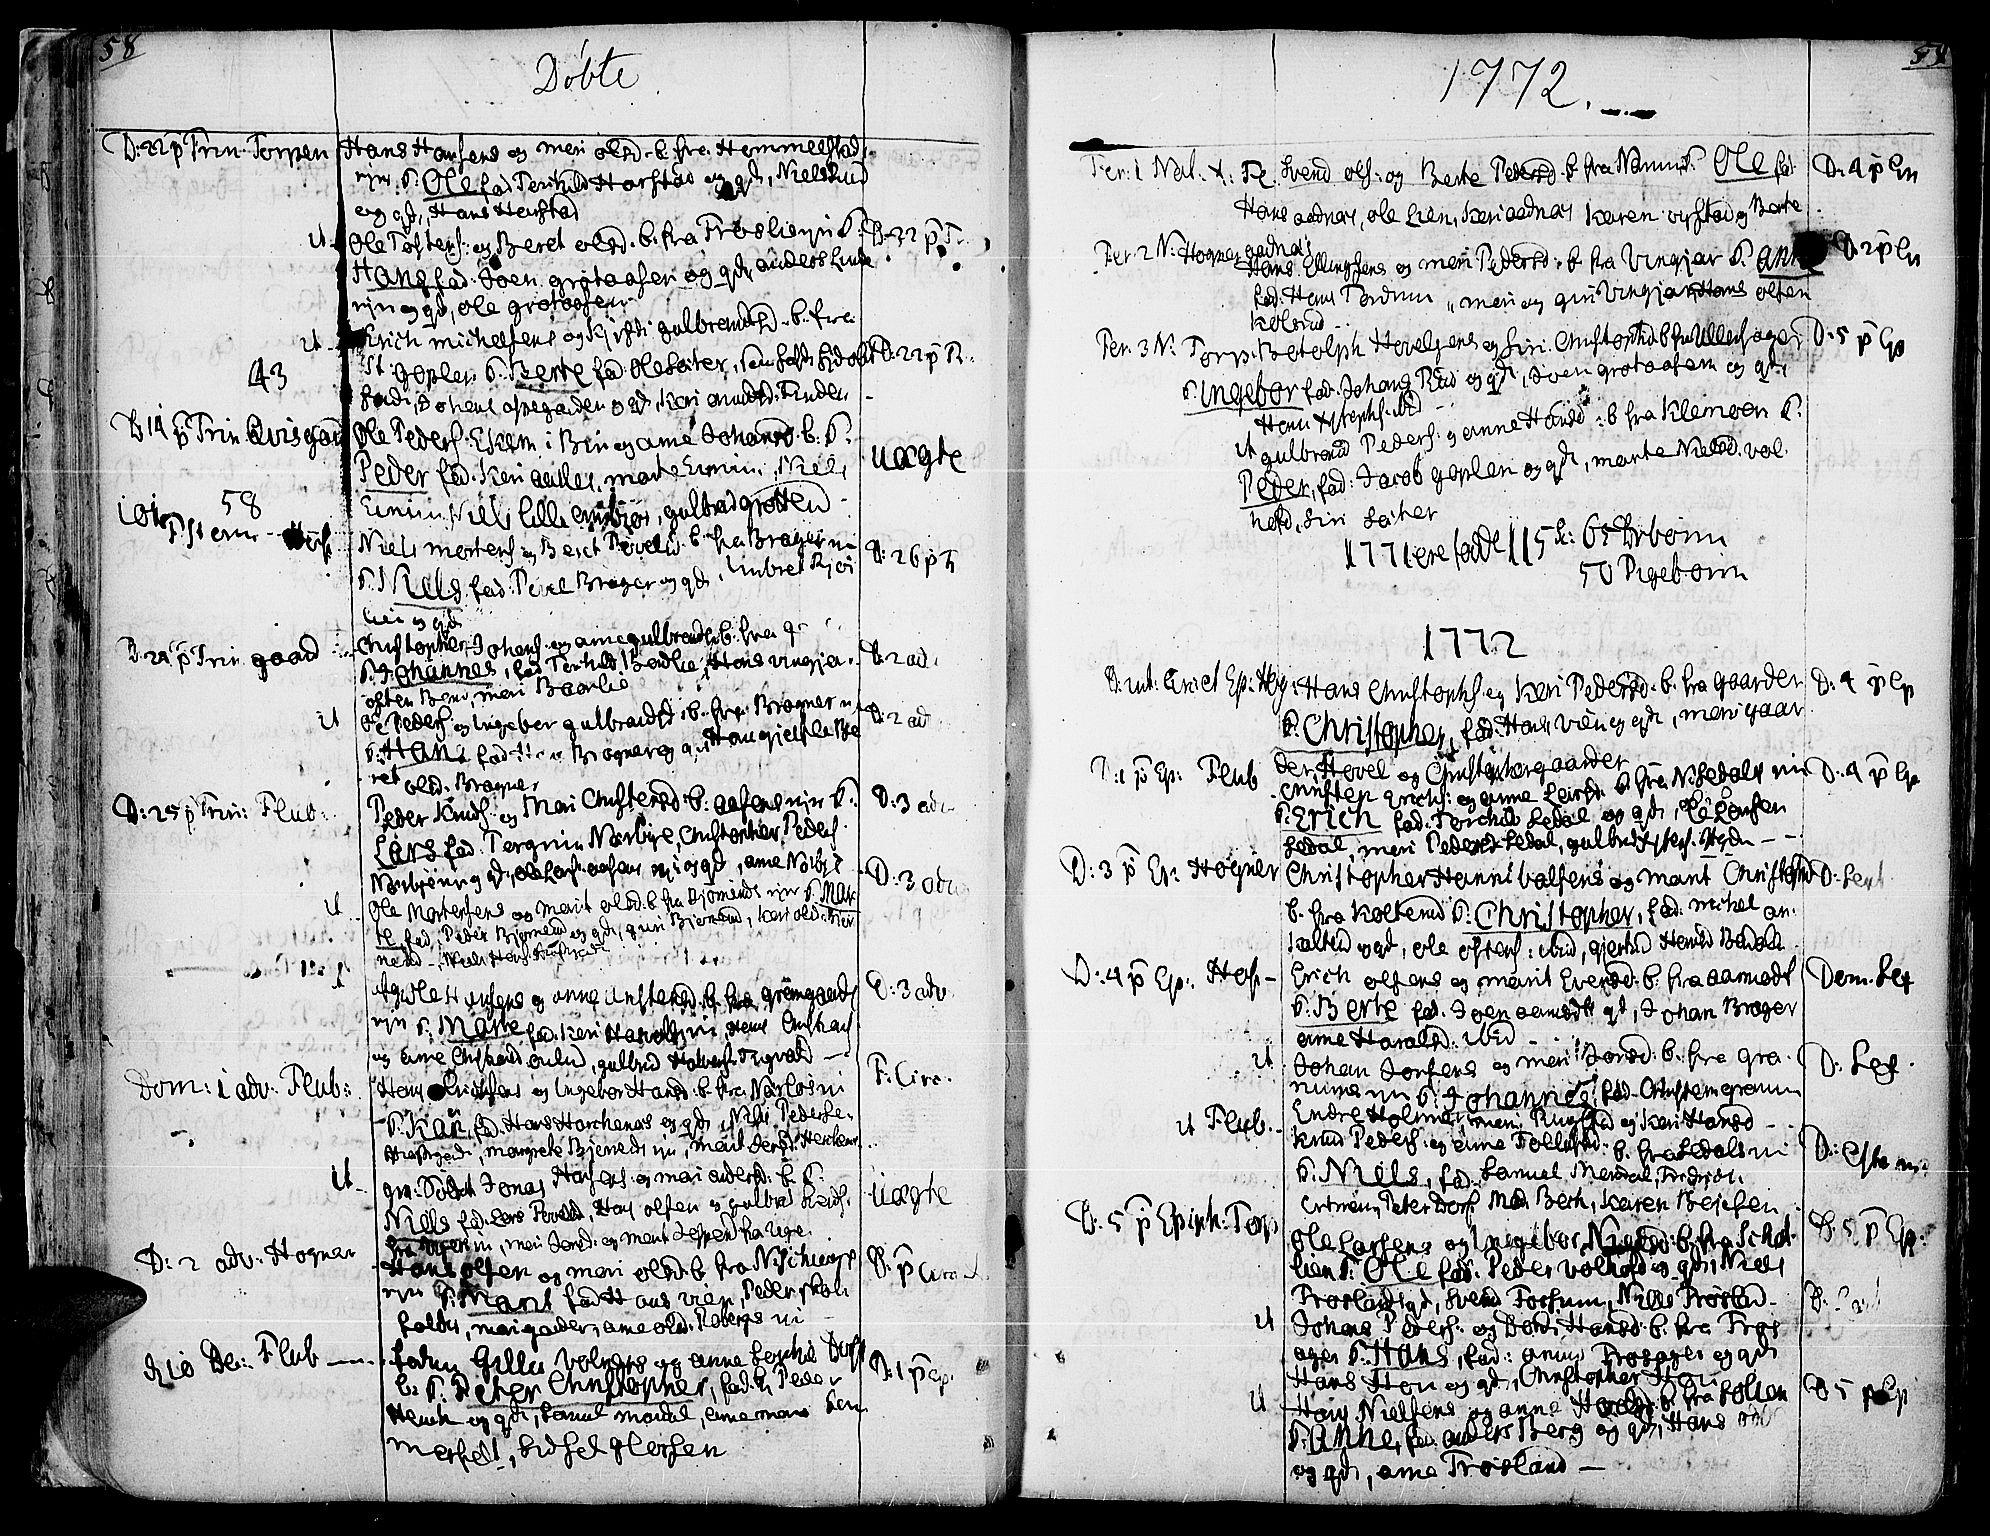 SAH, Land prestekontor, Ministerialbok nr. 5, 1765-1784, s. 58-59